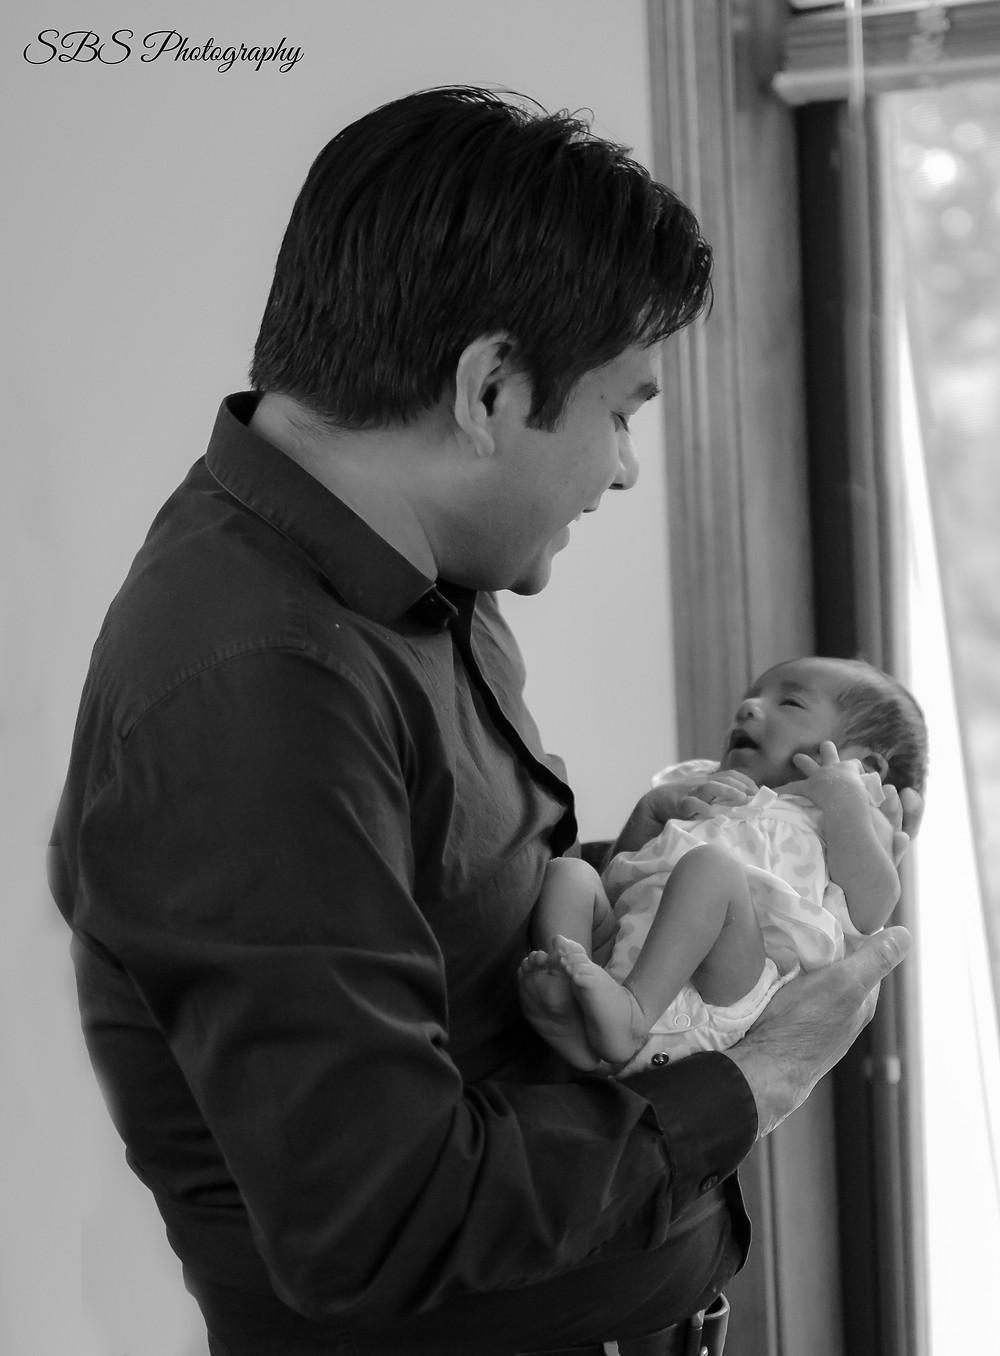 CT Newborn photographer, father daughter